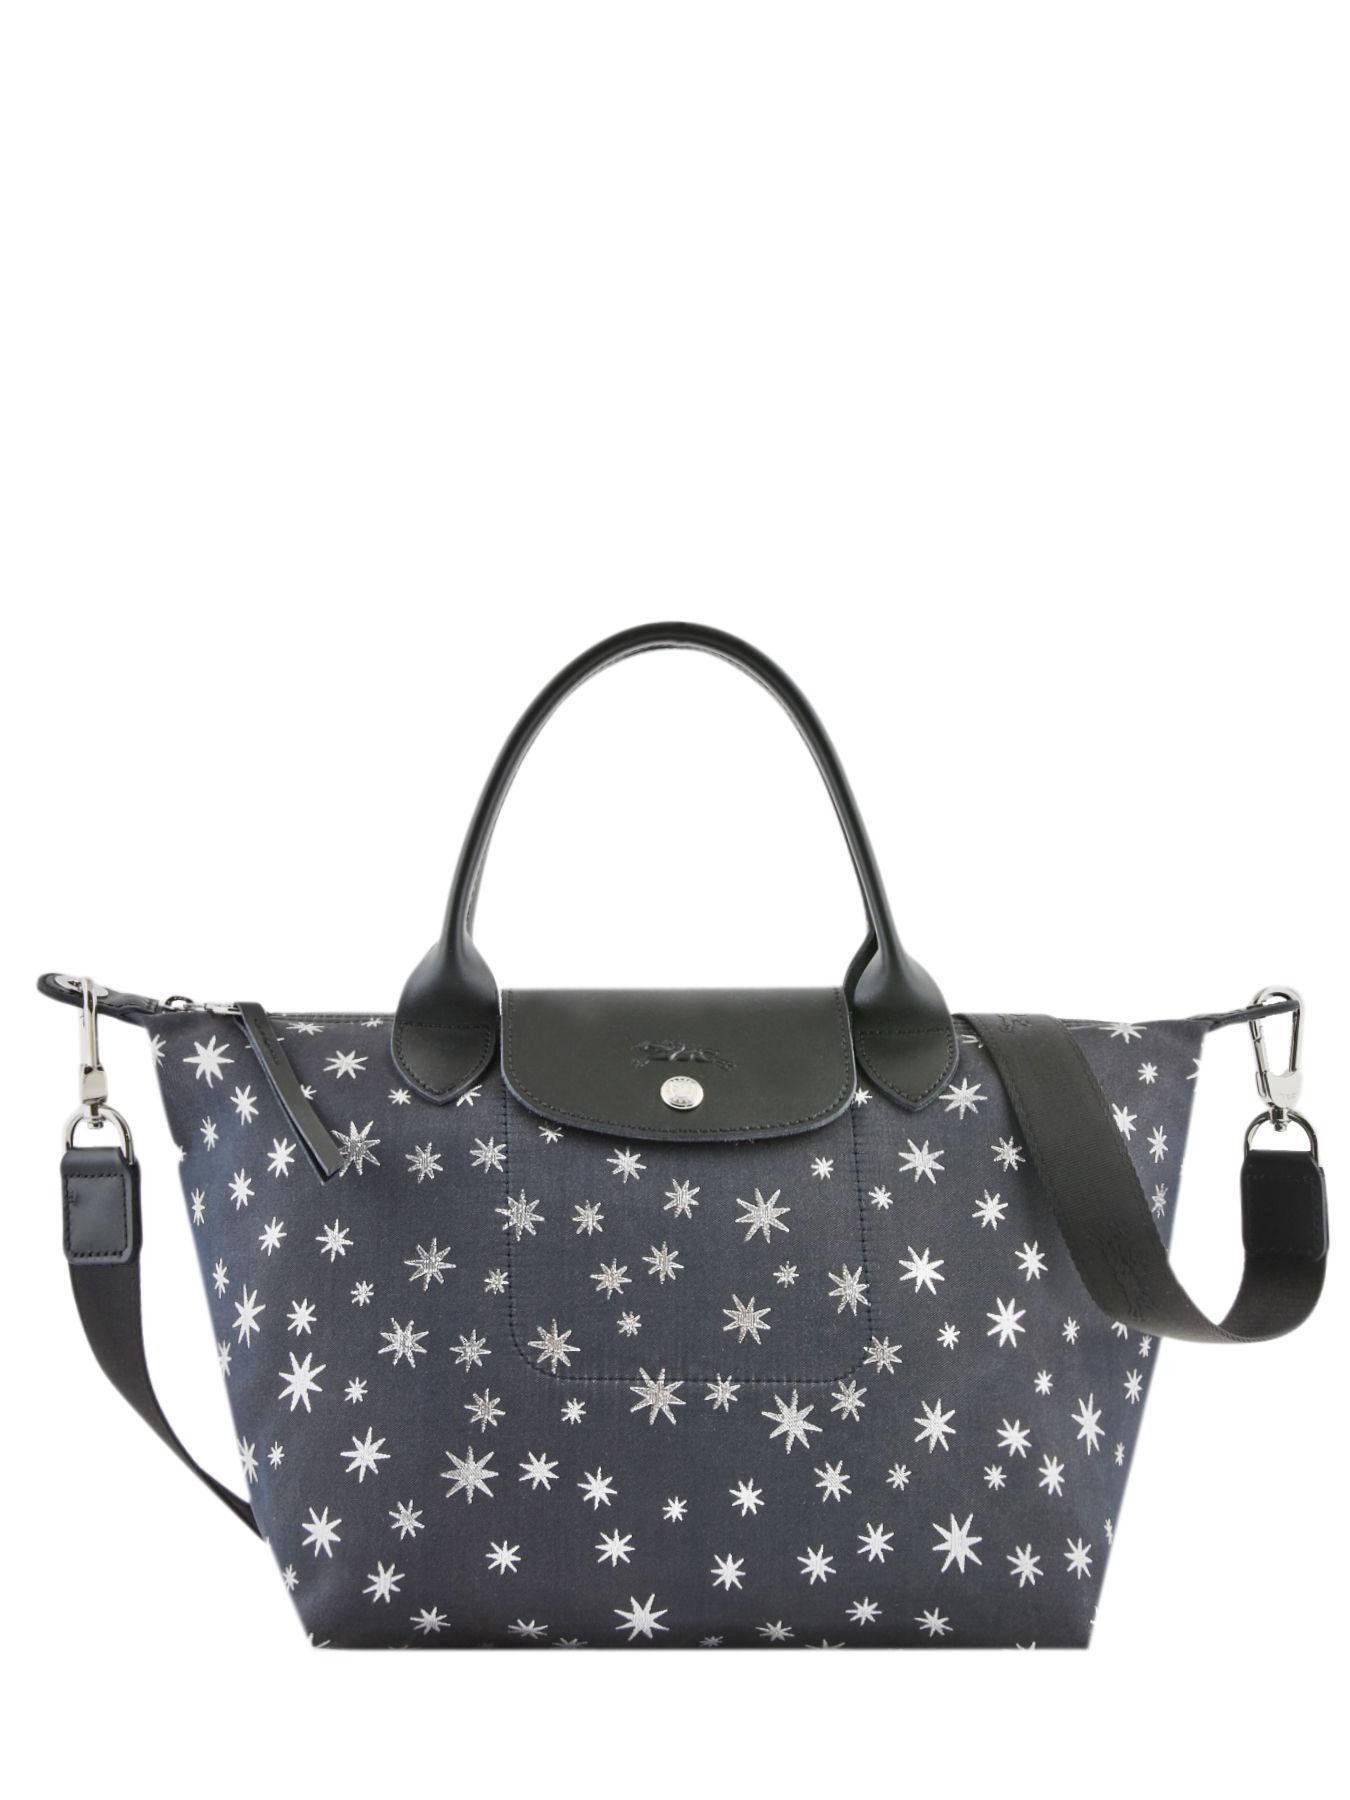 Shopping > sac longchamp, Up to 68% OFF